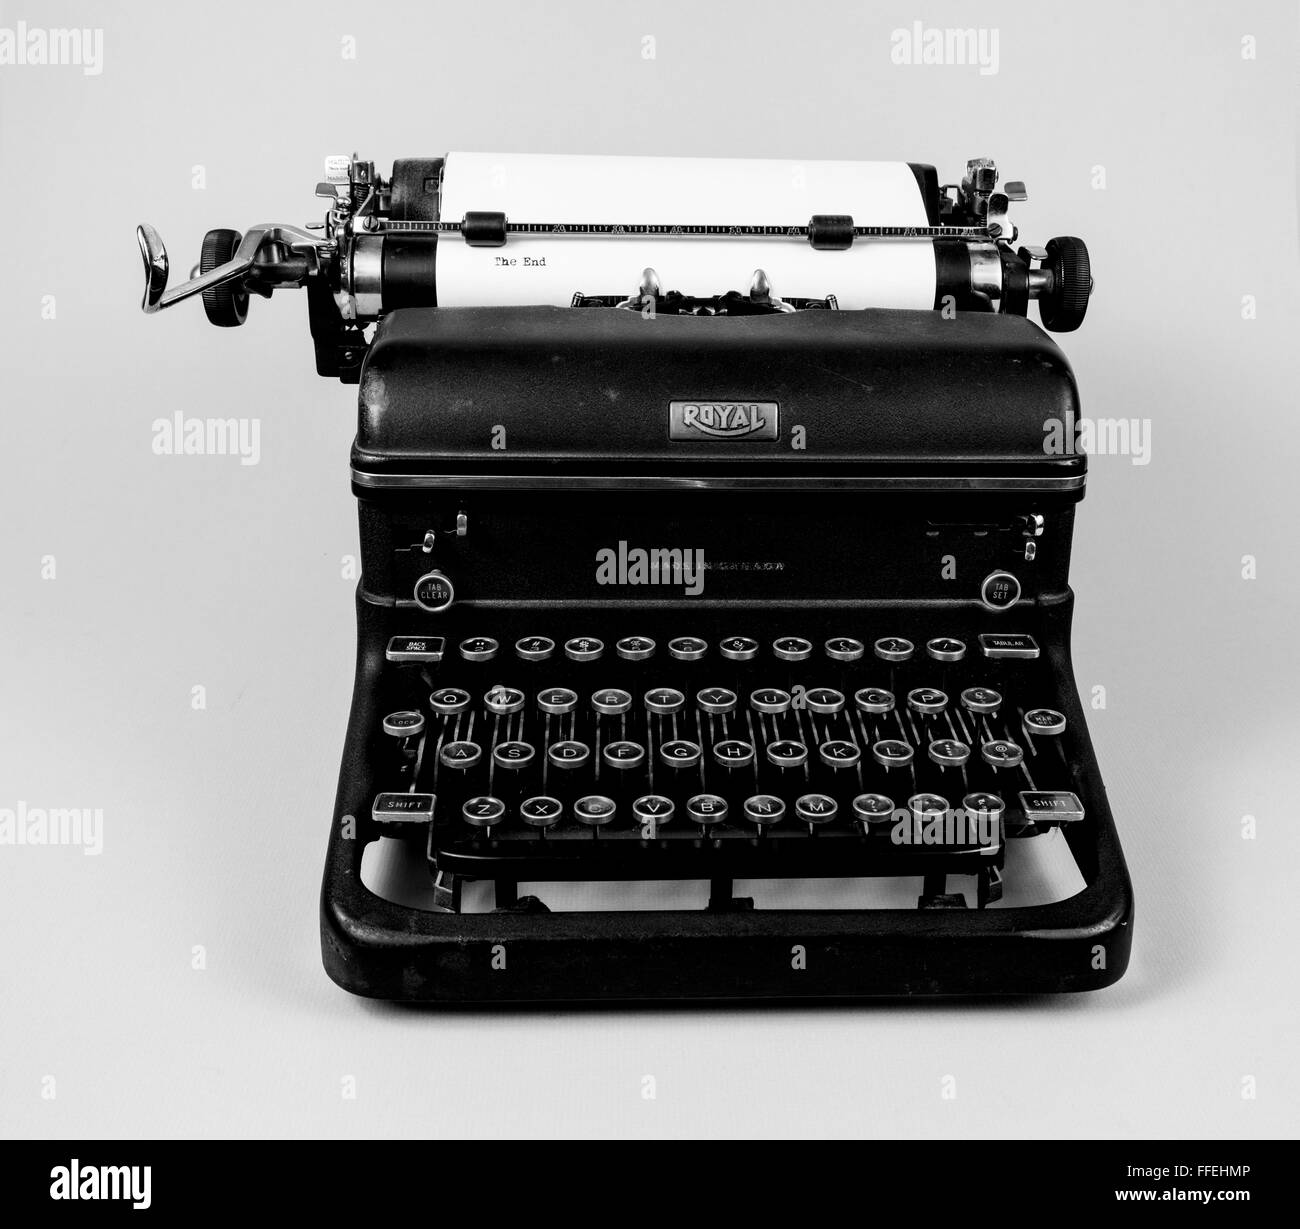 Vintage typewriter on white background - Stock Image